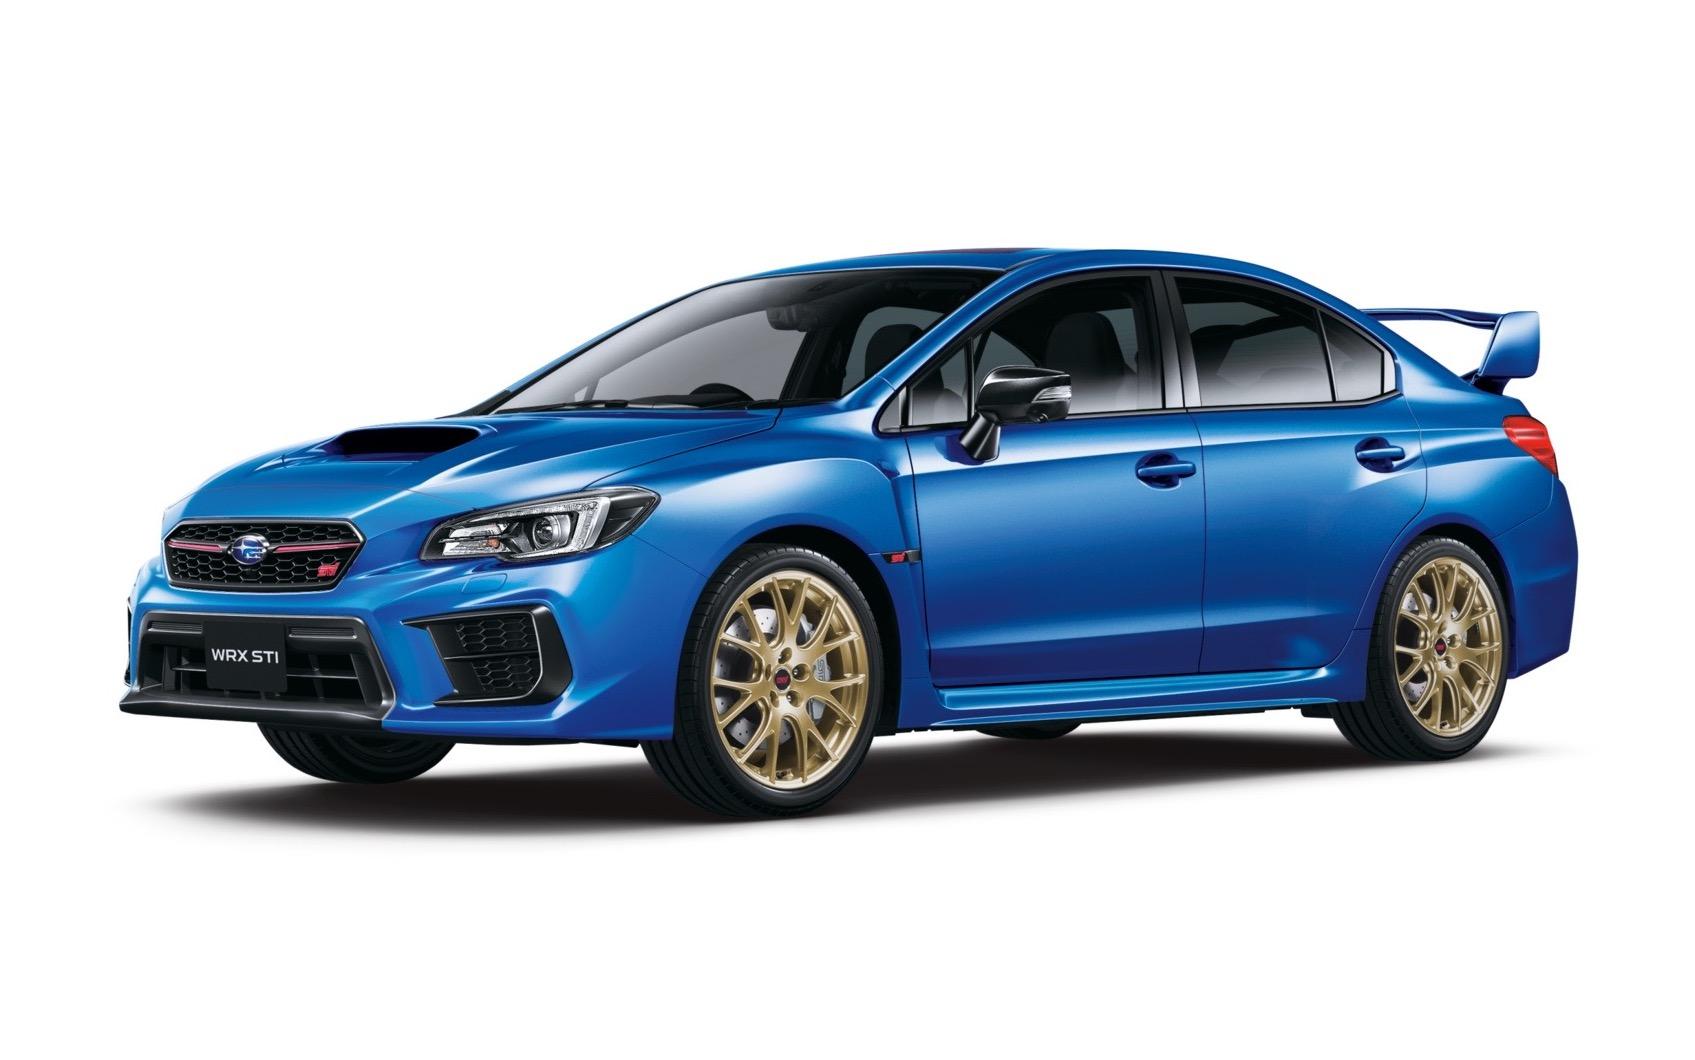 2021 Subaru WRX STI 'Final Edition' announced for Australia